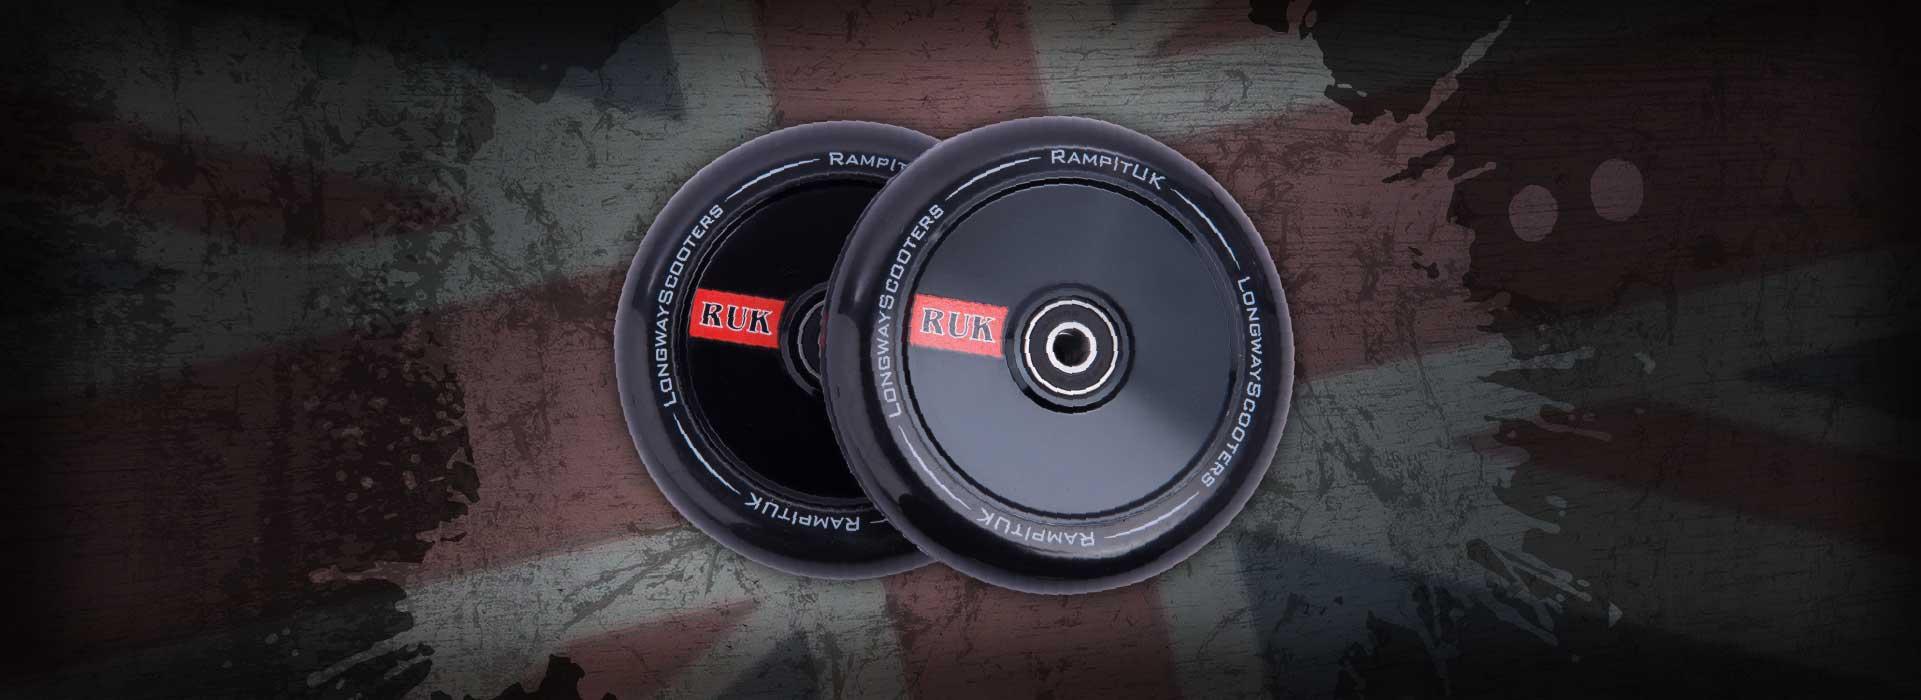 Longway - RUK Signature Wheels